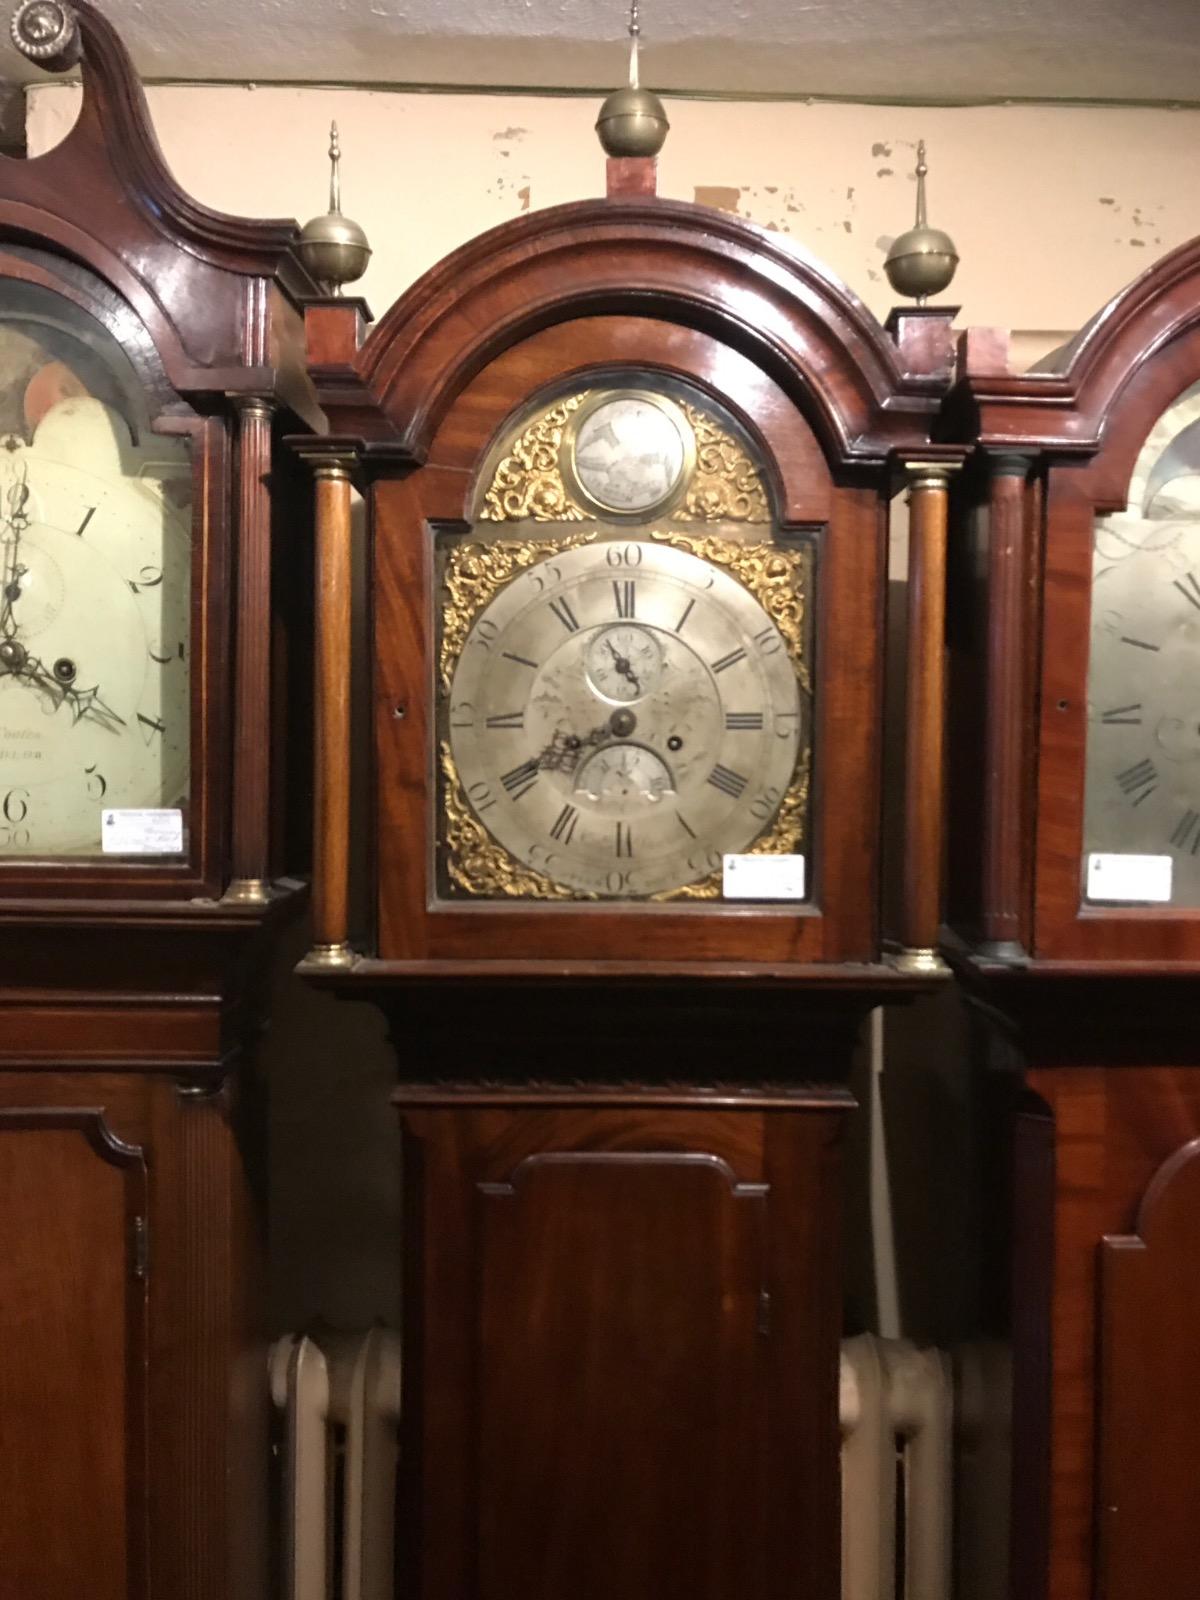 8 Day Longcase clock (1 of 1)